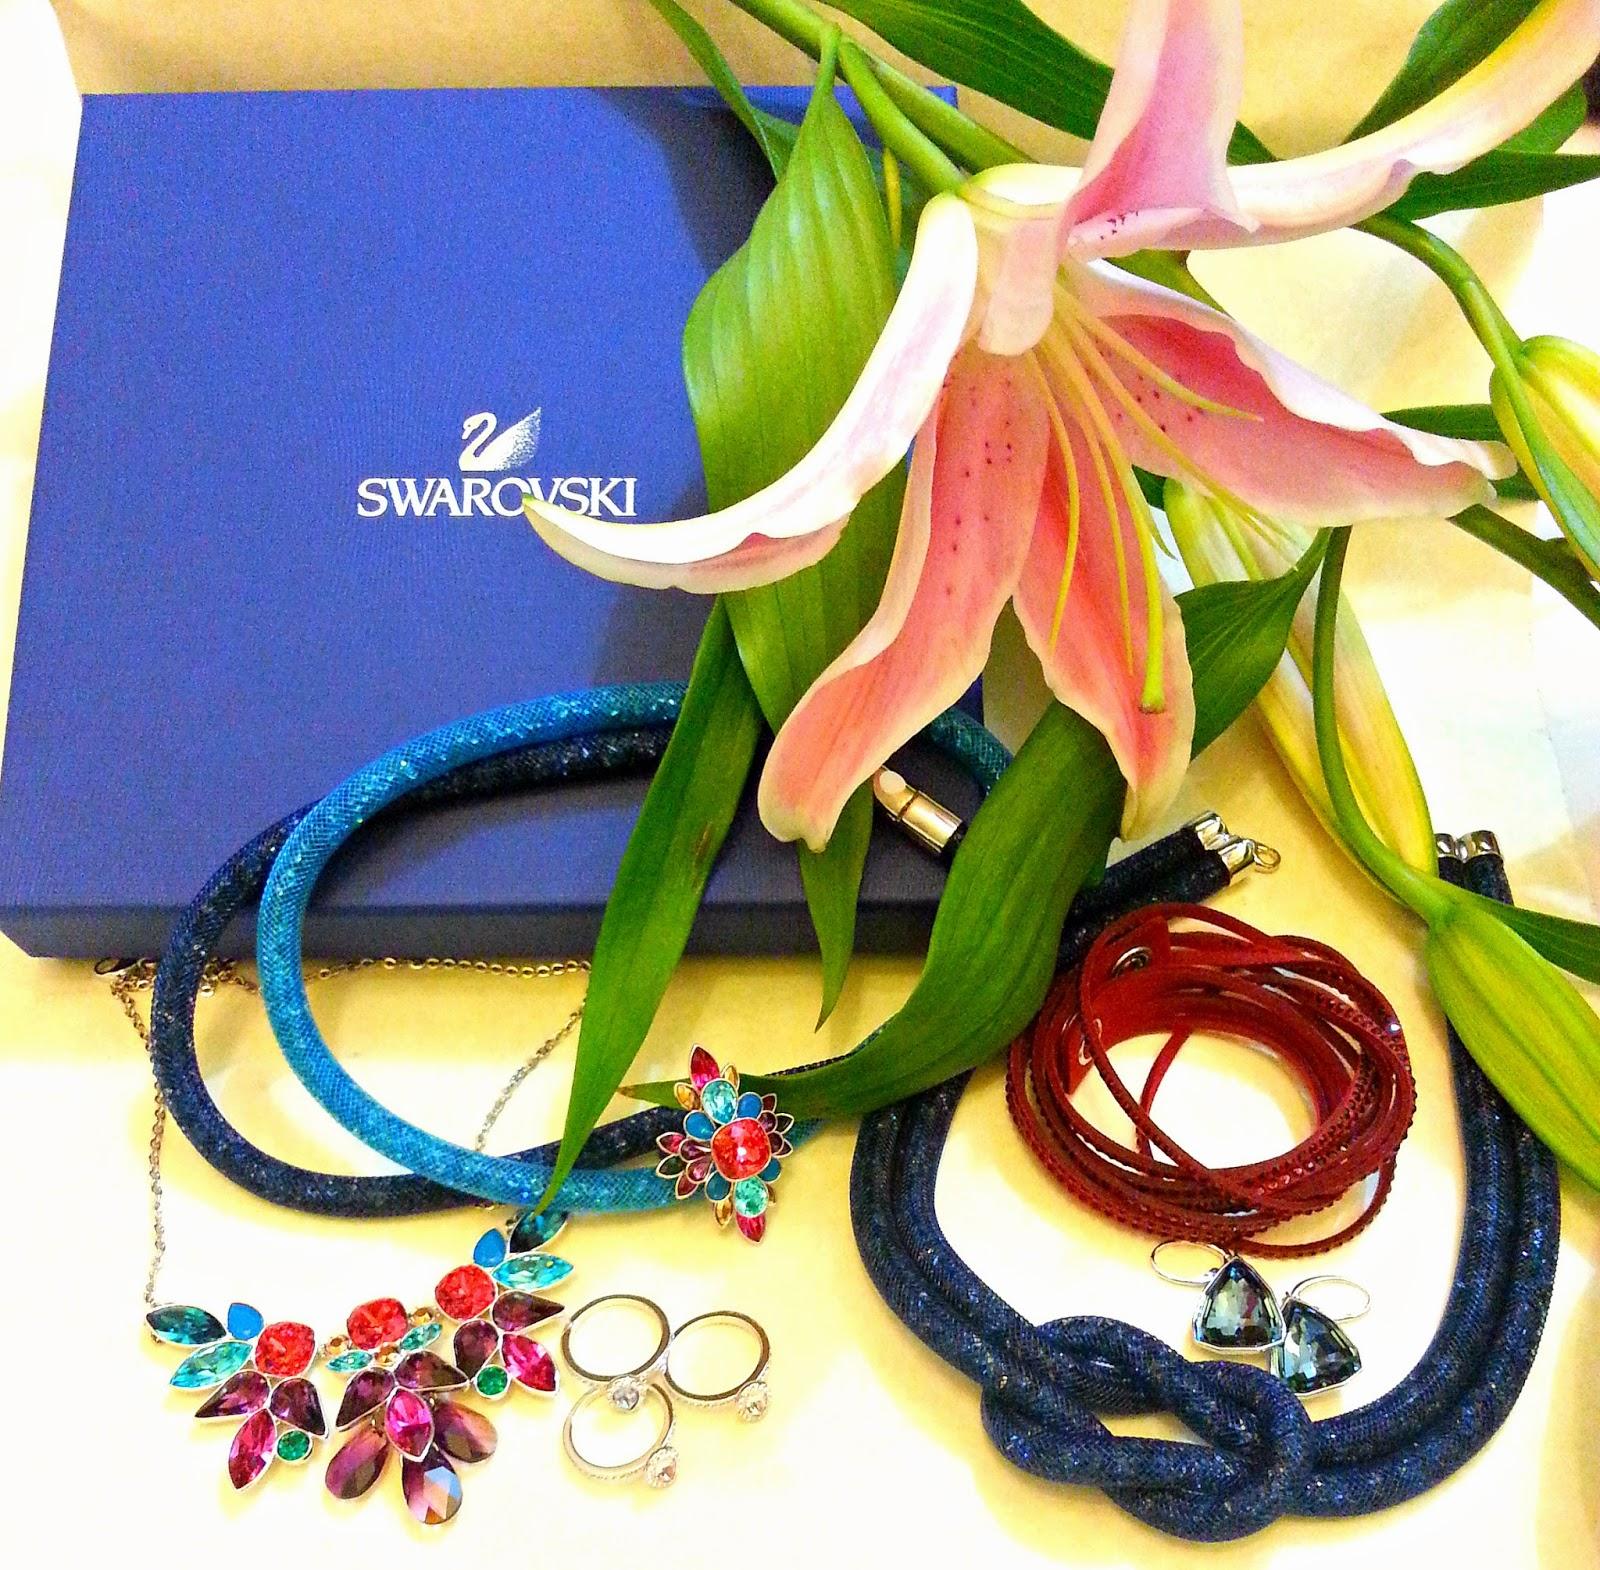 Swarovski Stardust Bracelets, Slake Bracelet, Cardinal Floral Ring, Pastel Christie Ring Set, Stardust Knot Neclace, Cardinal Floral Necklace